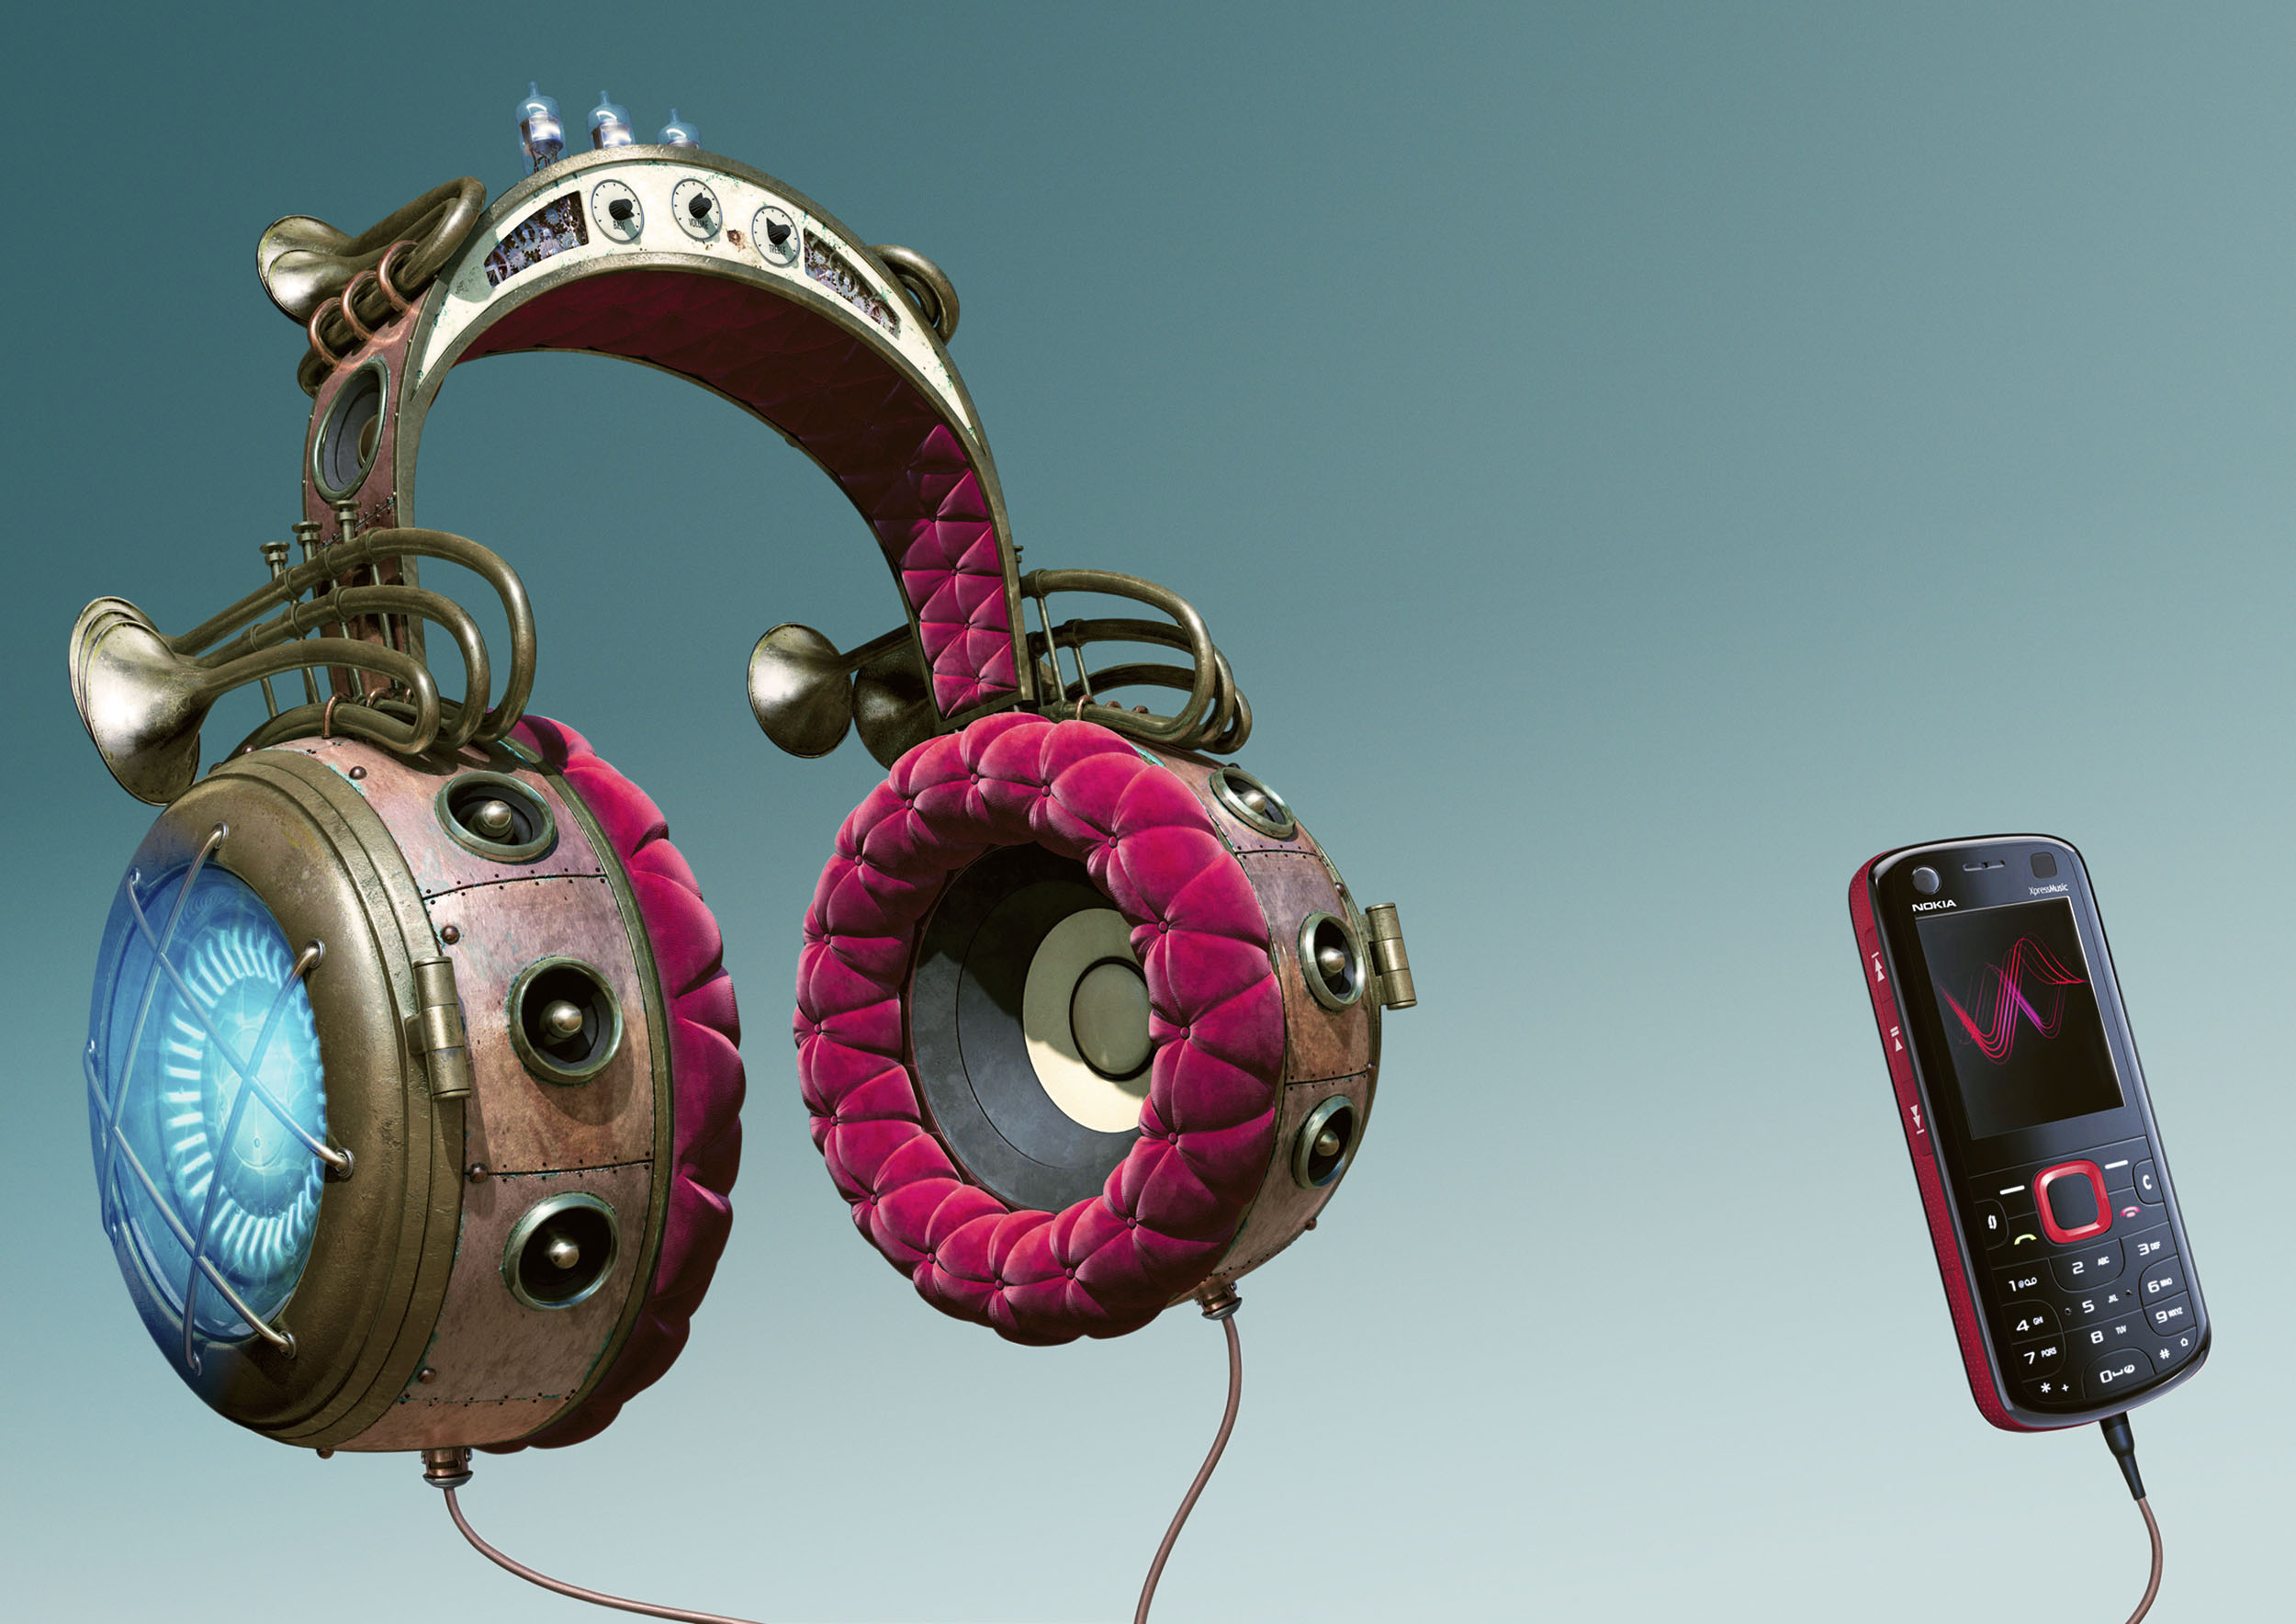 BOOM_CGI_PRODUCT_sony-jules-vern-headphones.jpg